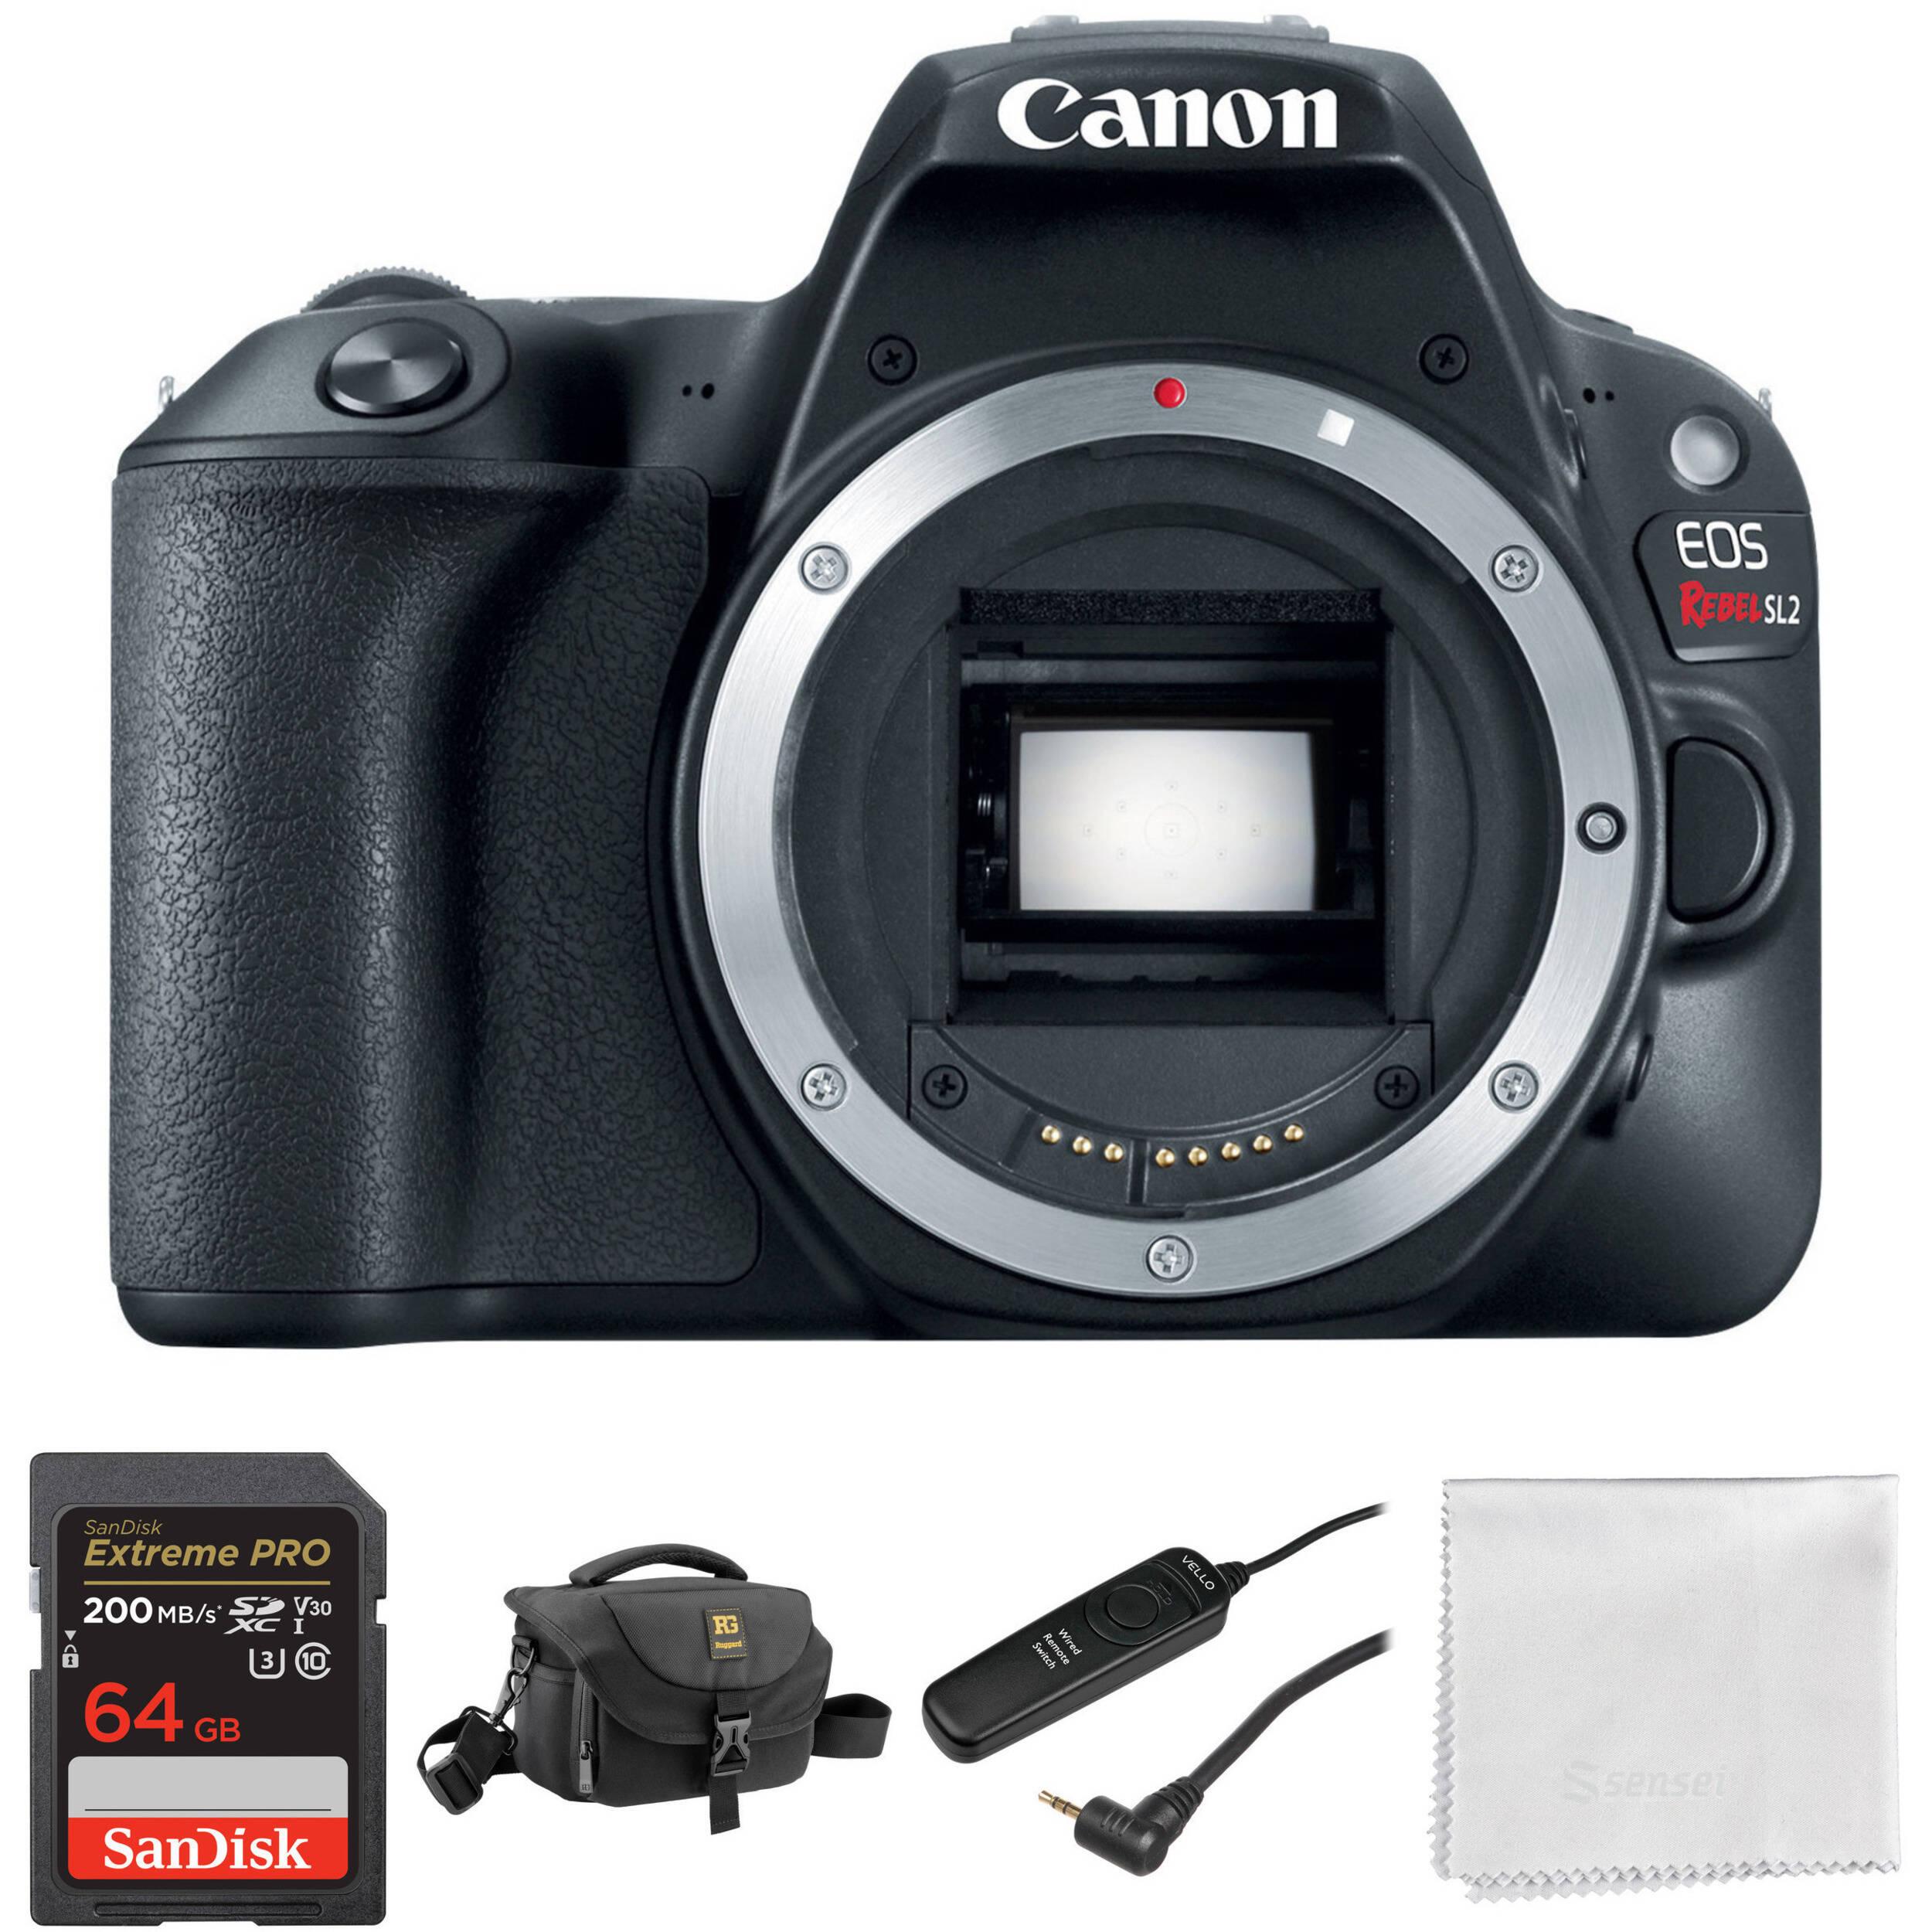 Canon EOS Rebel SL2 DSLR Camera Body Basic Kit